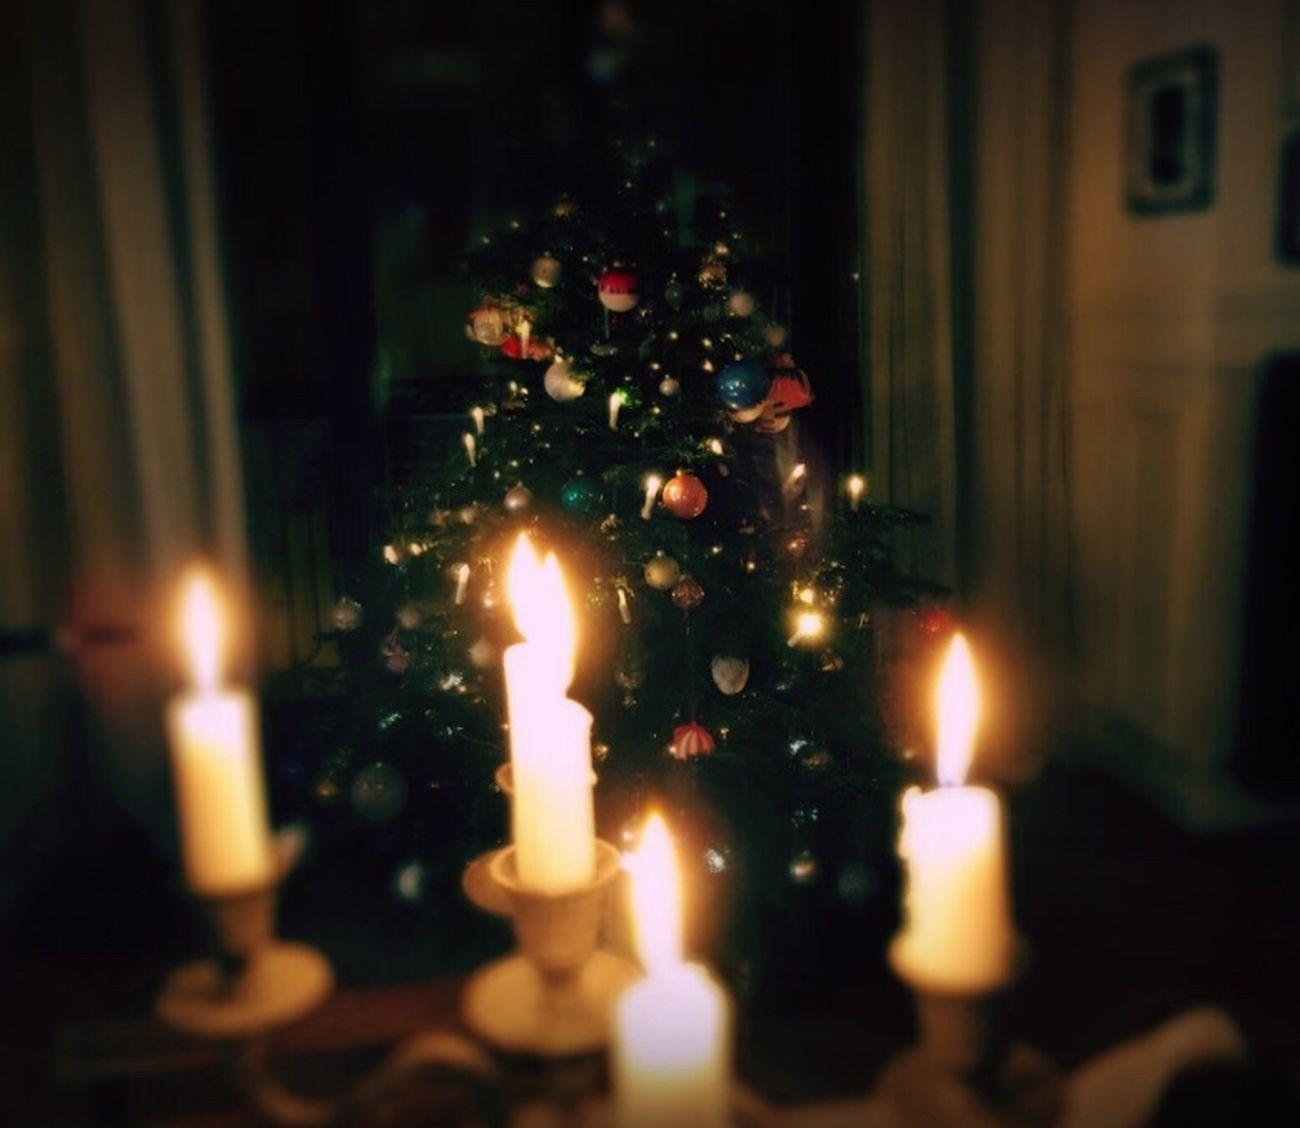 Christmas 2016 Illuminated Flame Burning Glowing Candle Celebration No People Christmas Heat - Temperature Indoors  Tradition Close-up Christmas Tree Night First Eyeem Photo